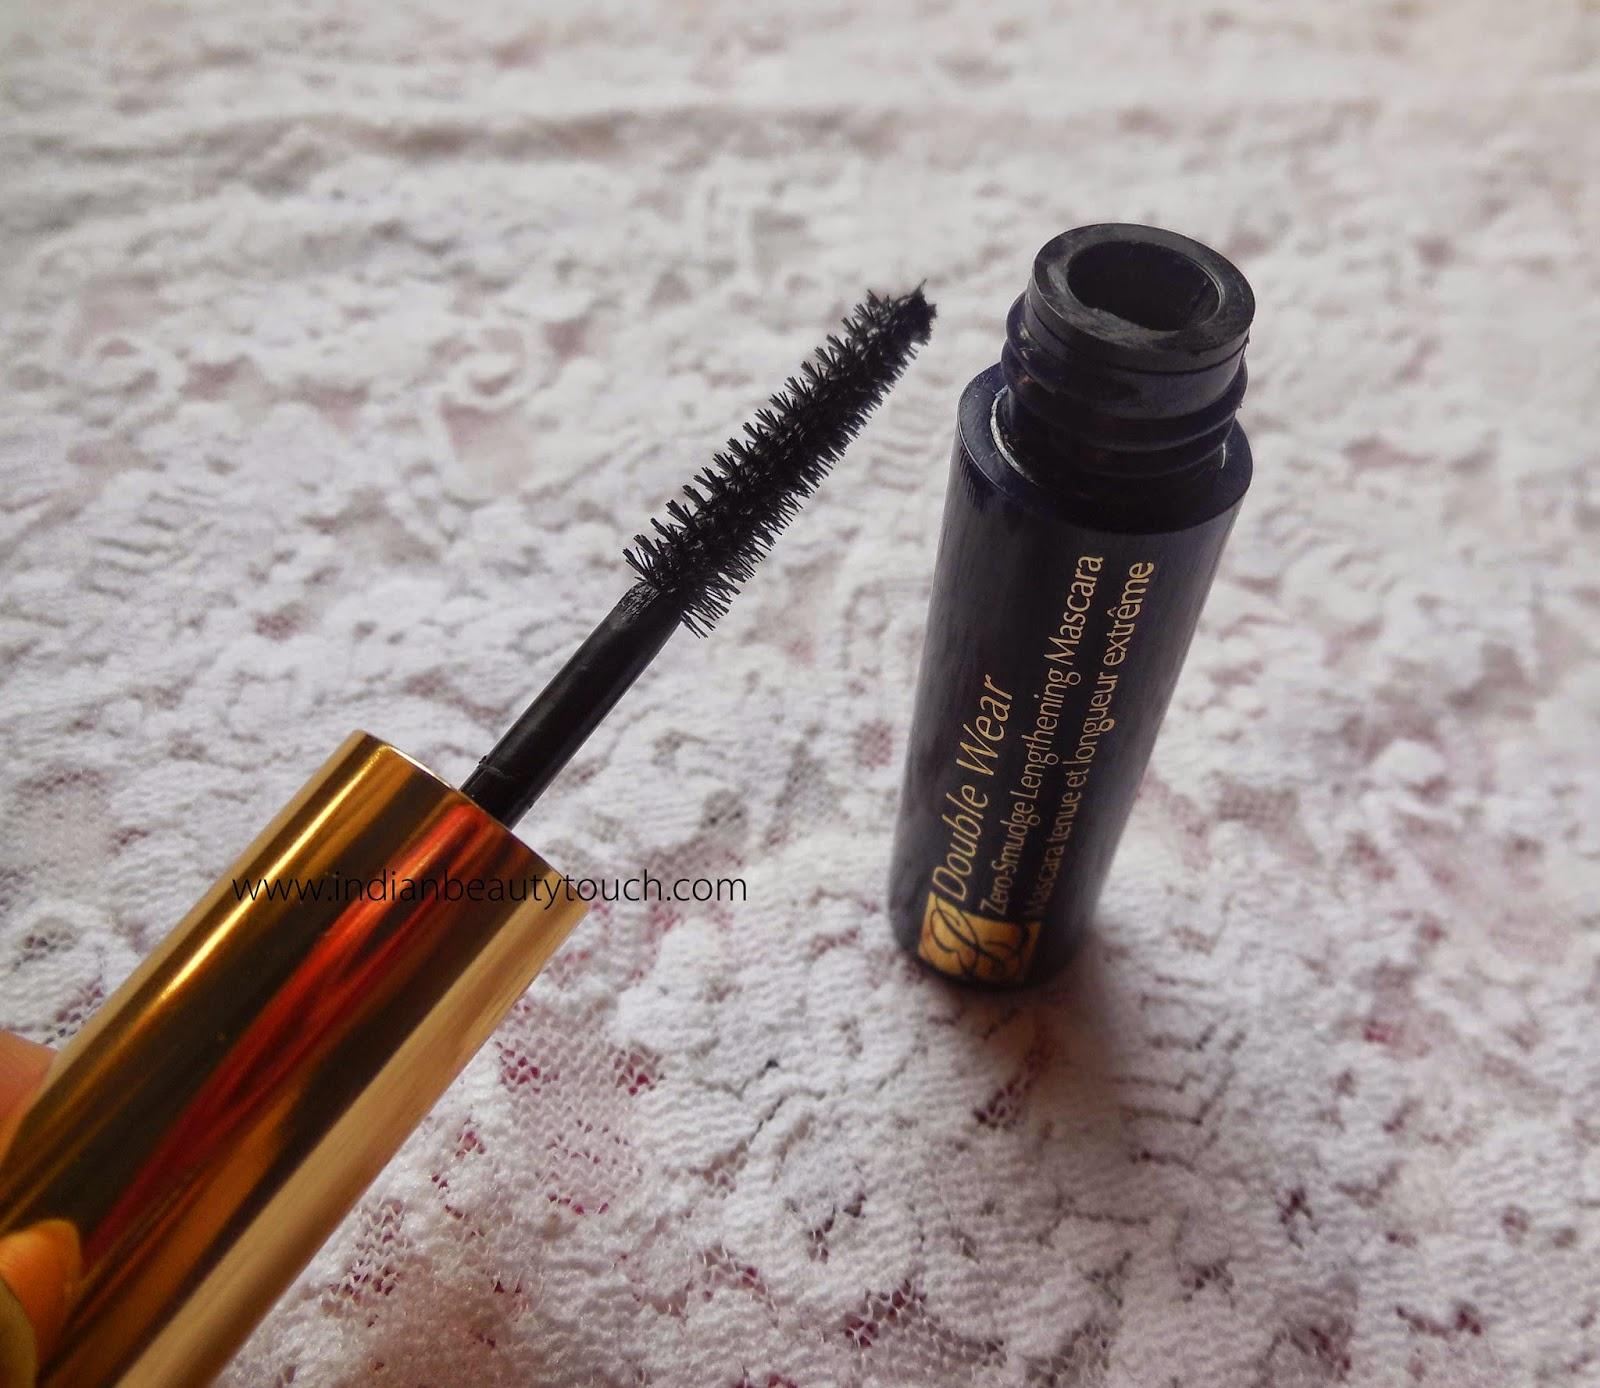 Estee Lauder Double Wear Zero Smudge Lengthening Mascara Review